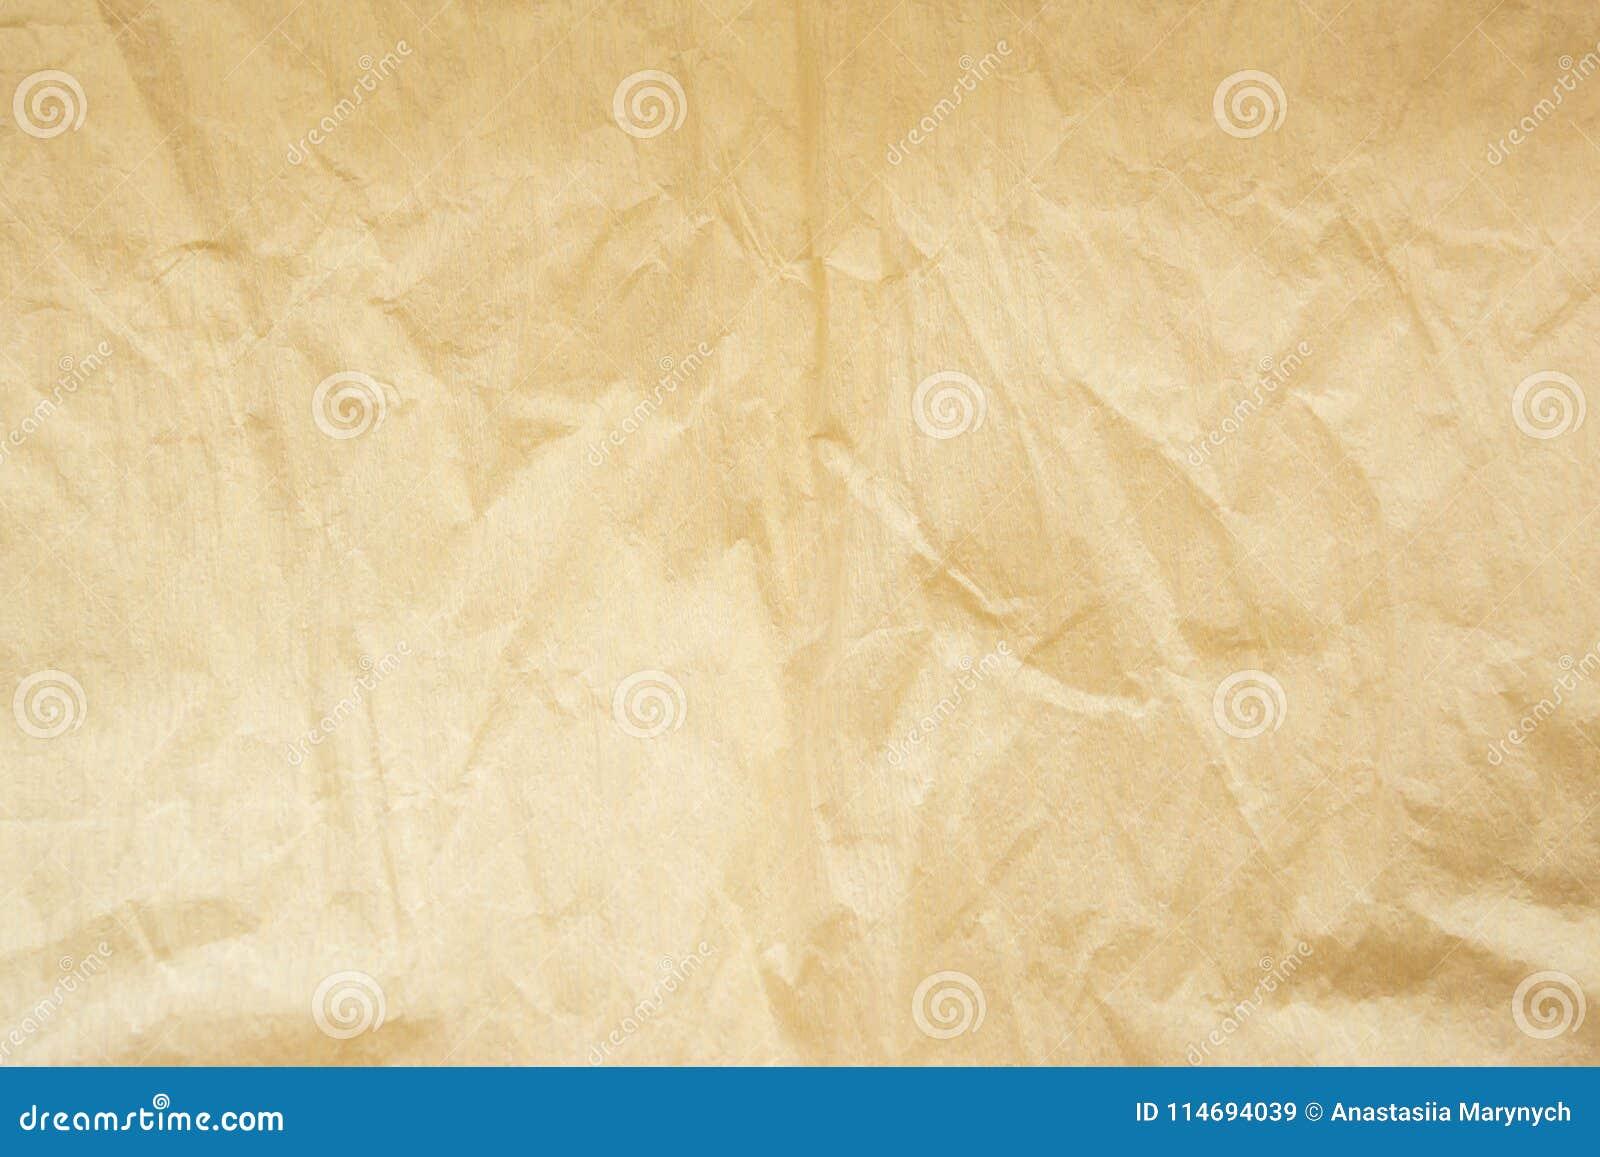 Sheet of worn beige paper as background